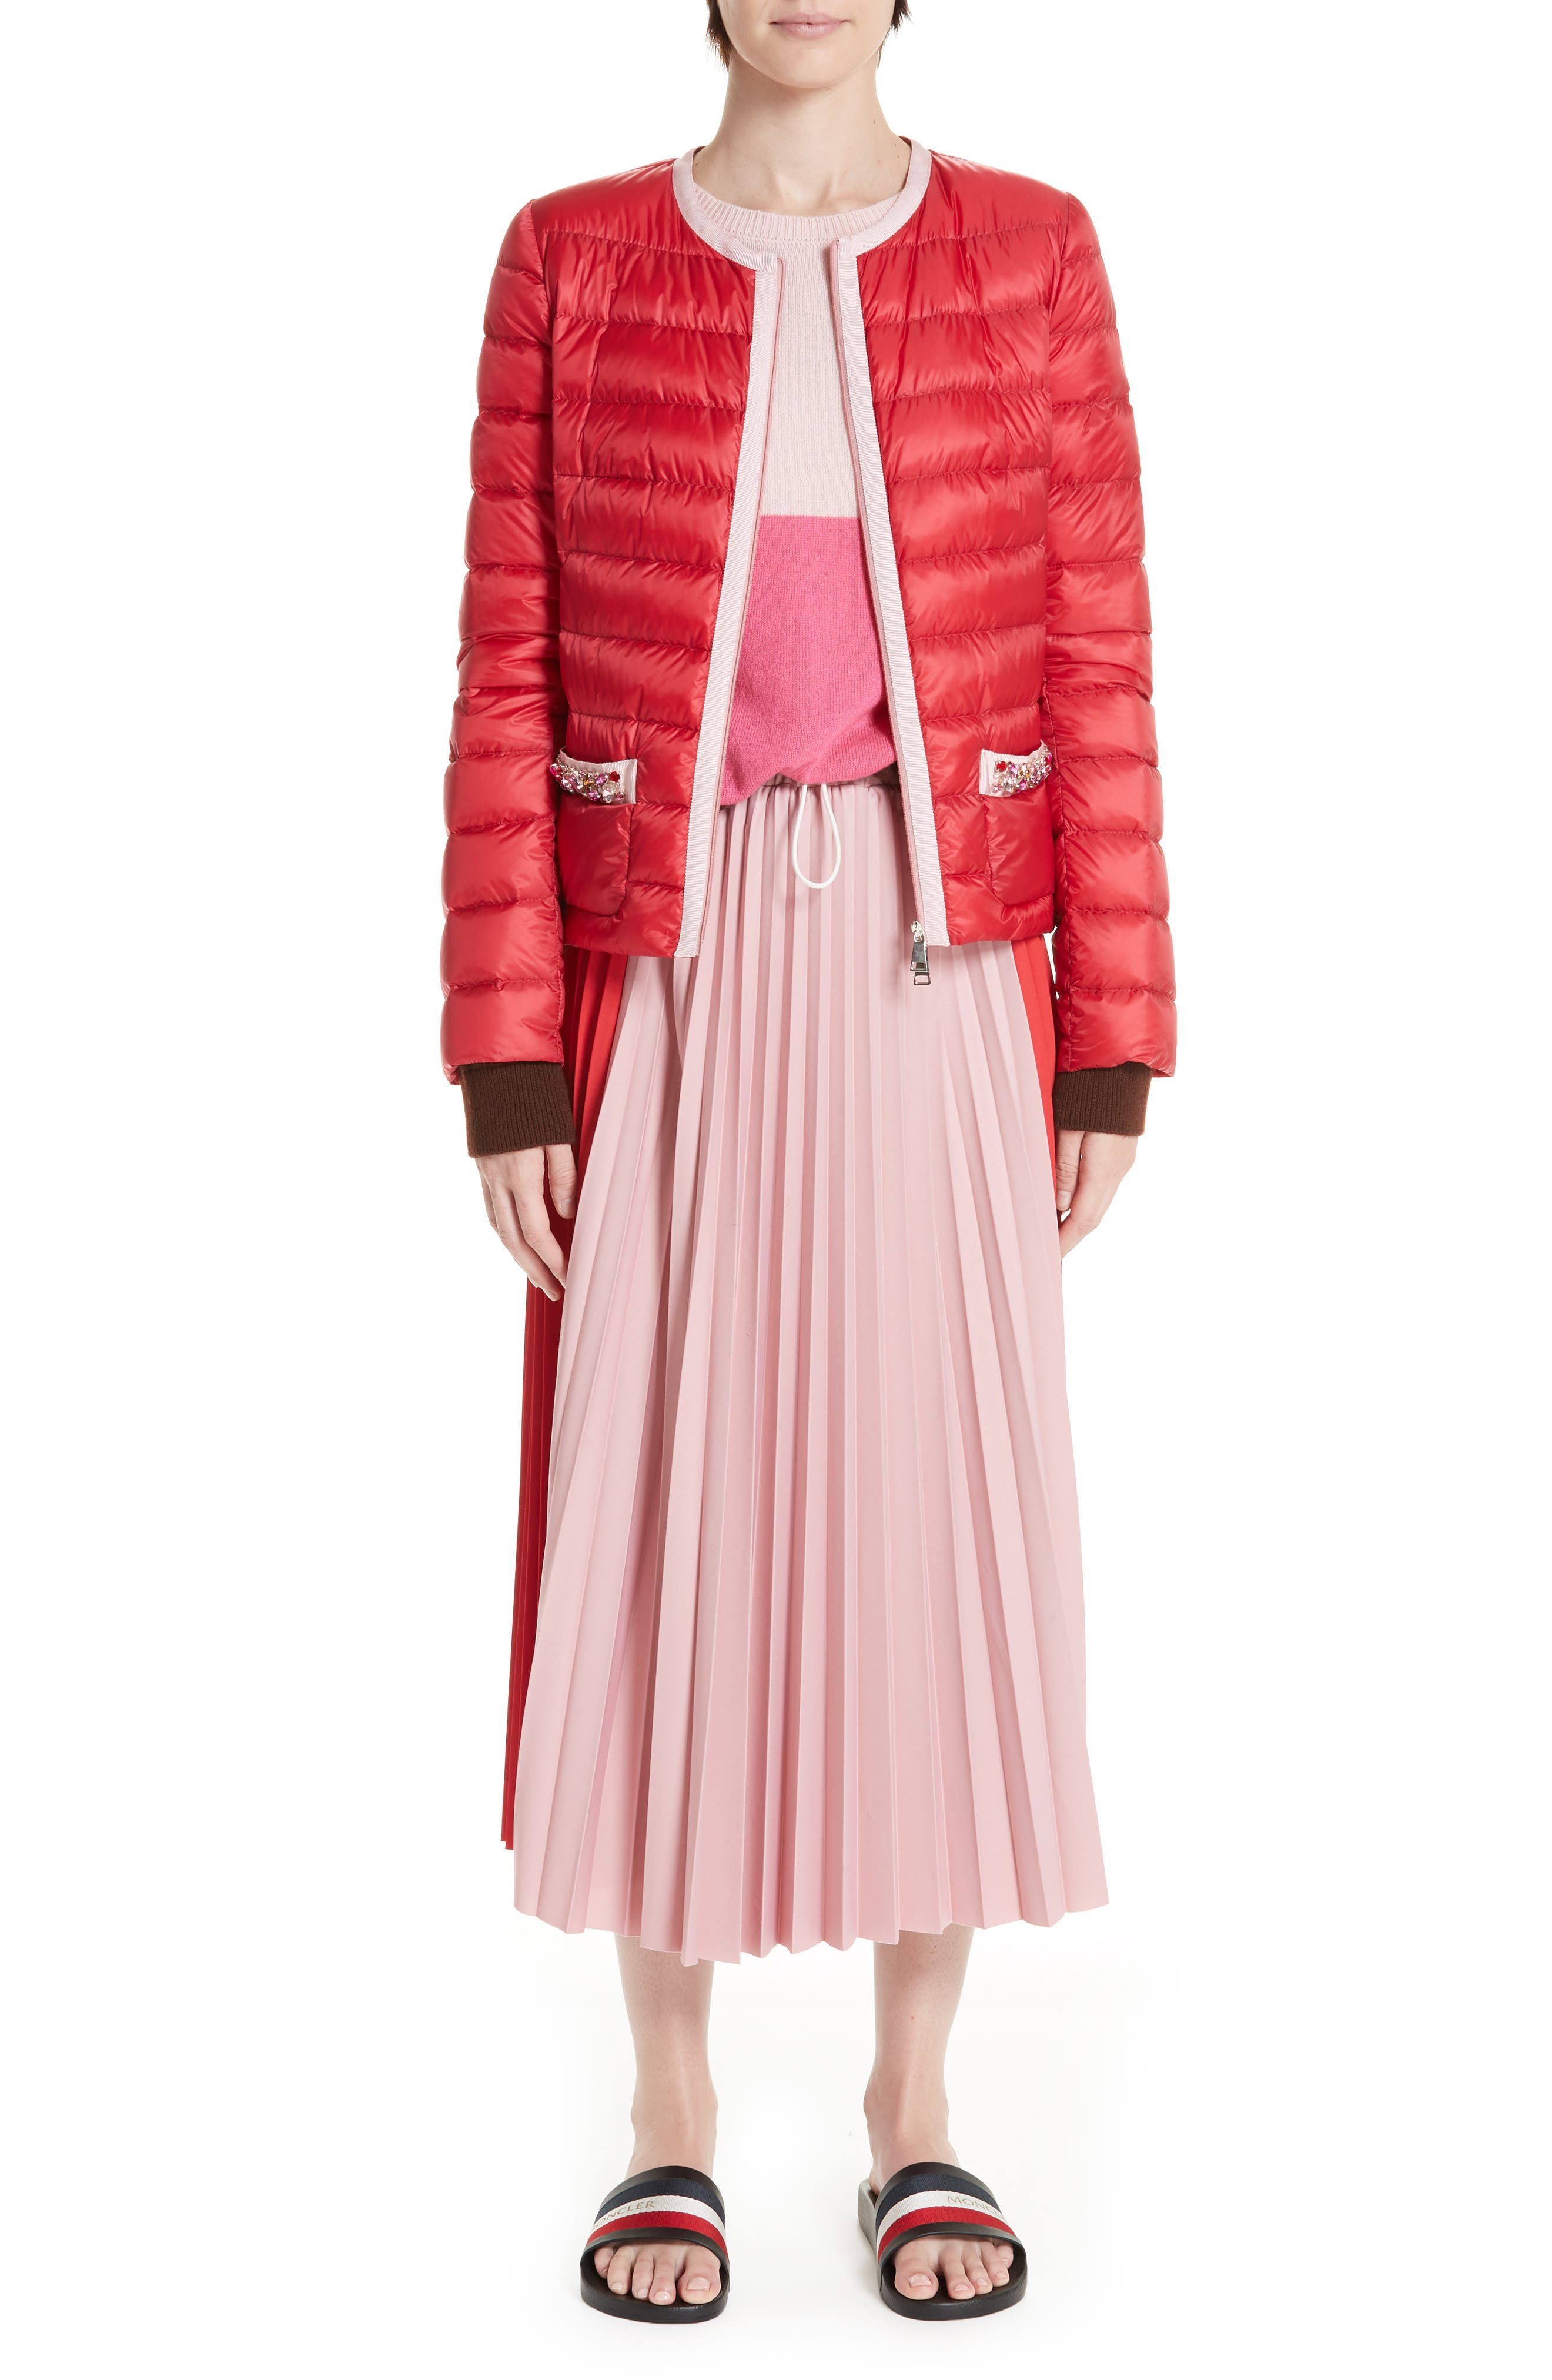 MONCLER, Cristalline Jacket, Alternate thumbnail 8, color, RED